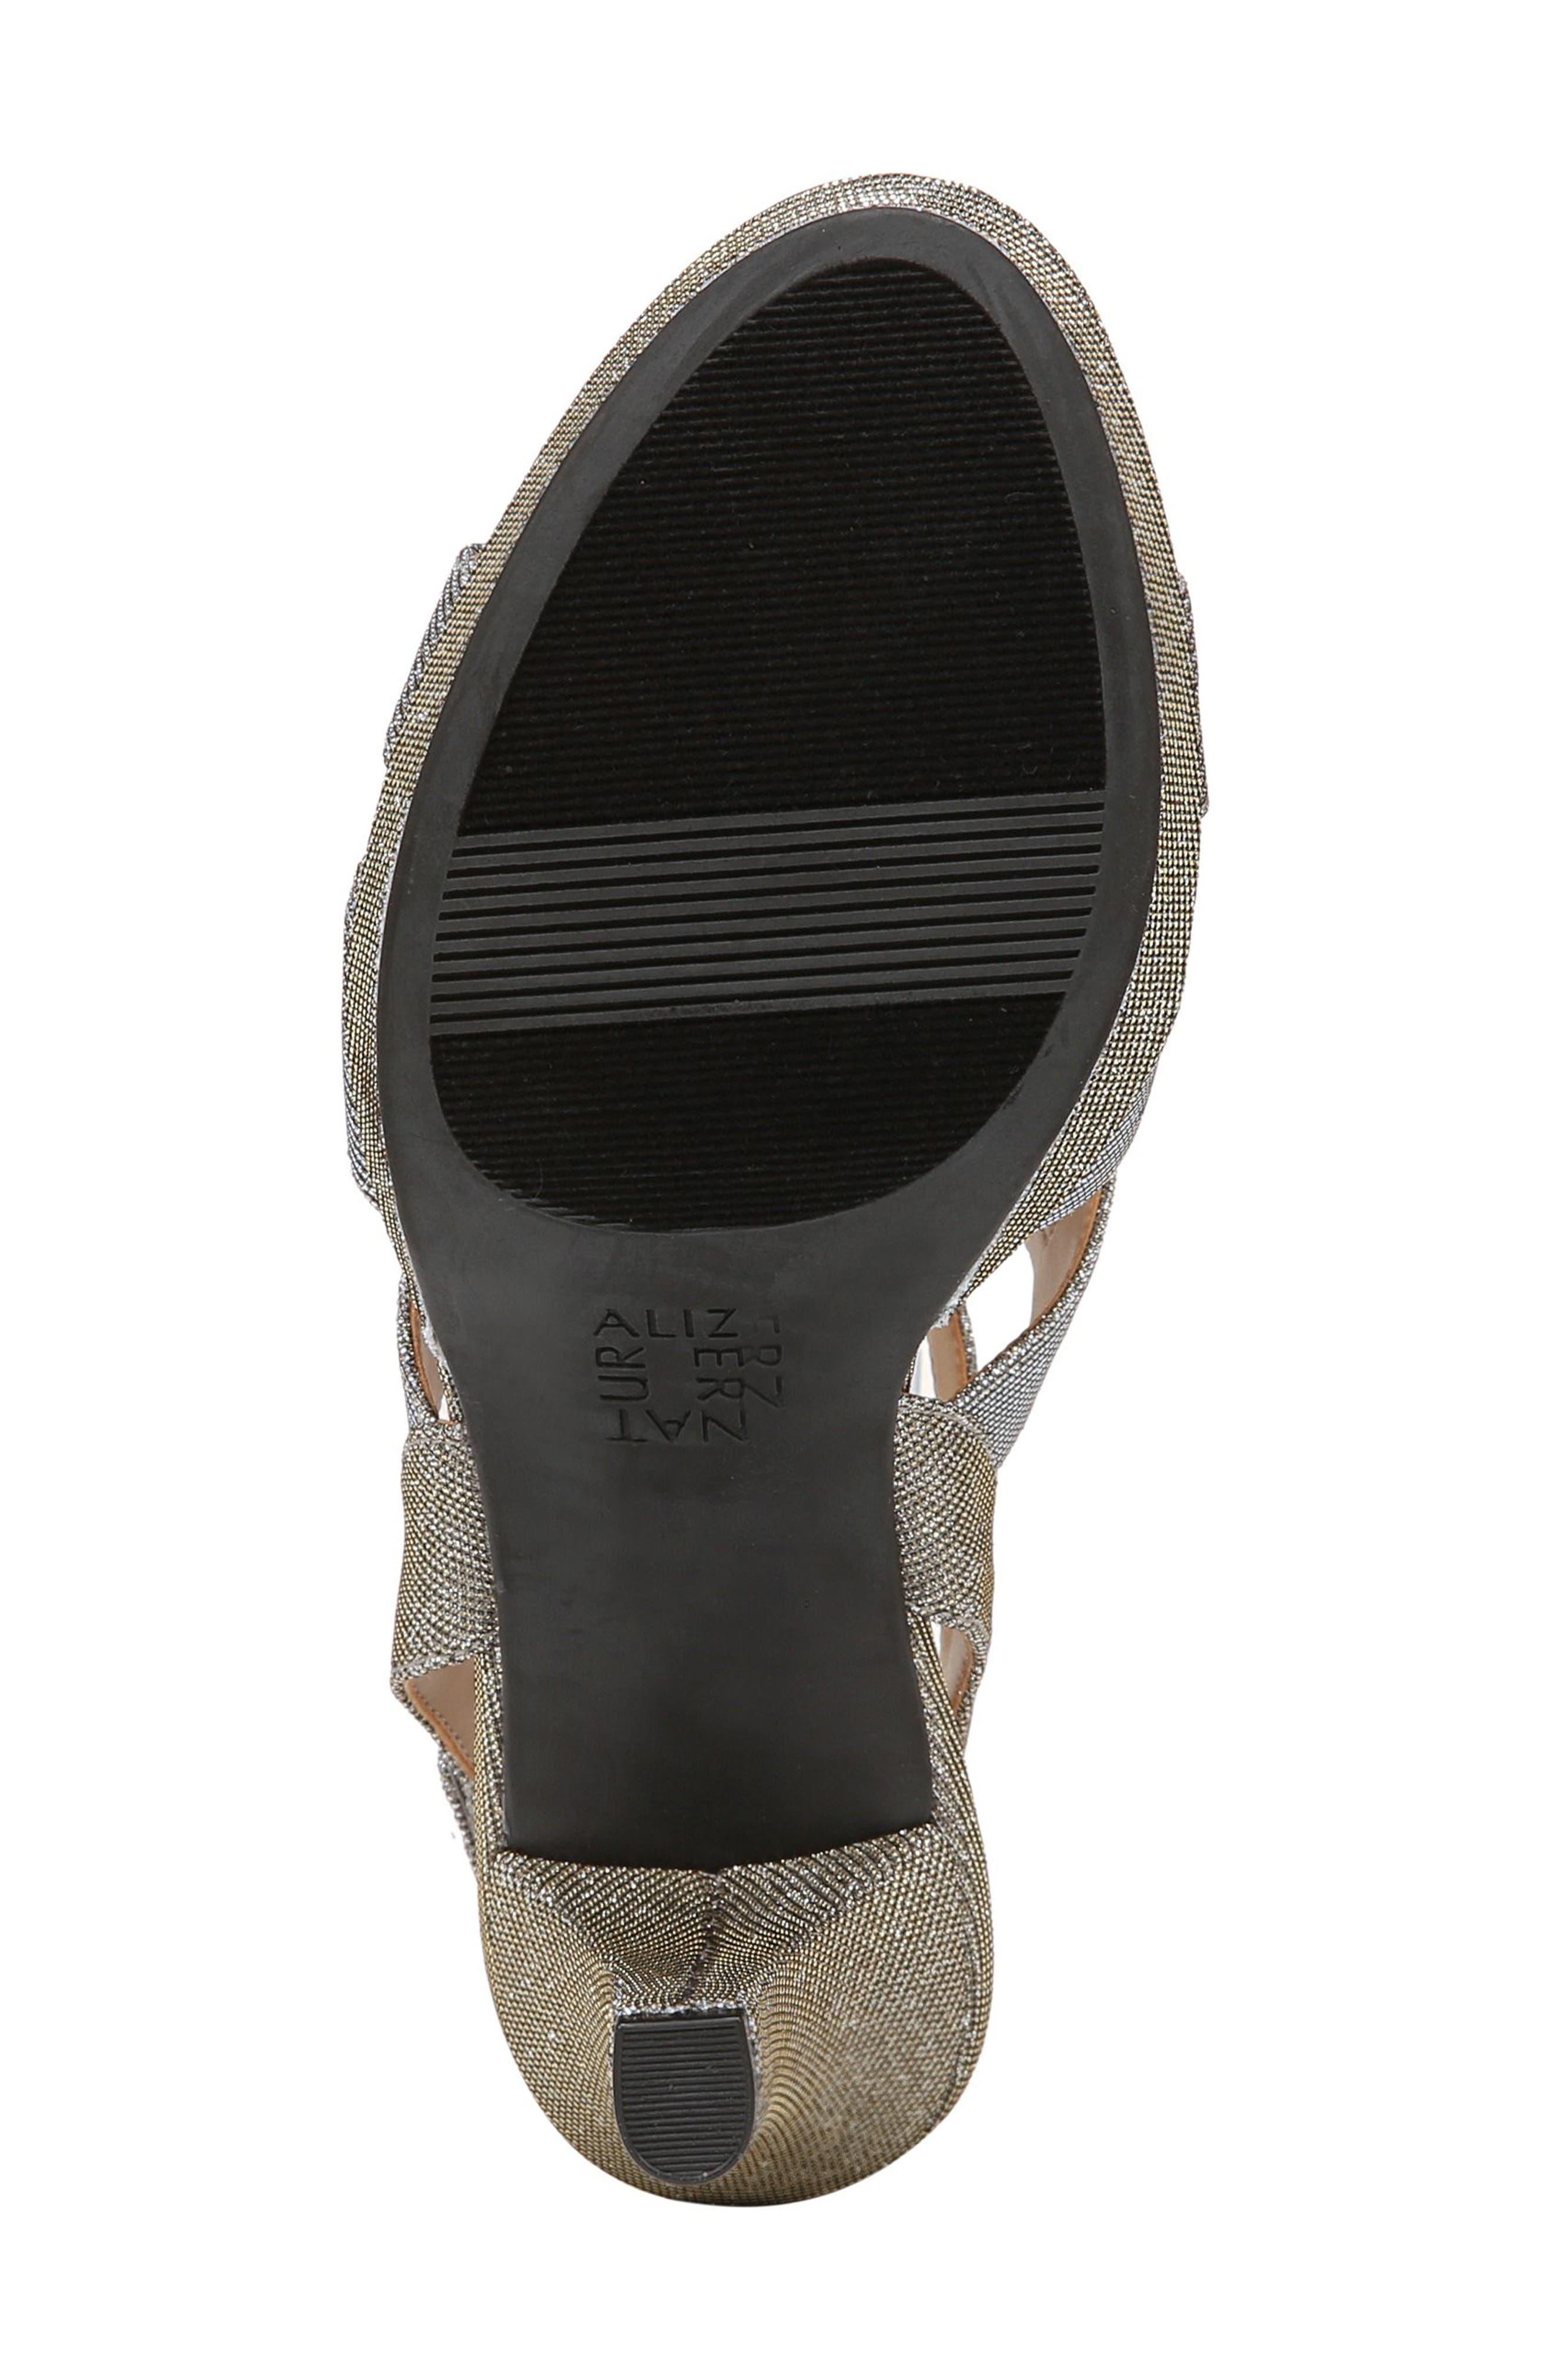 'Pressley' Slingback Platform Sandal,                             Alternate thumbnail 6, color,                             Alloy Sparkle Fabric